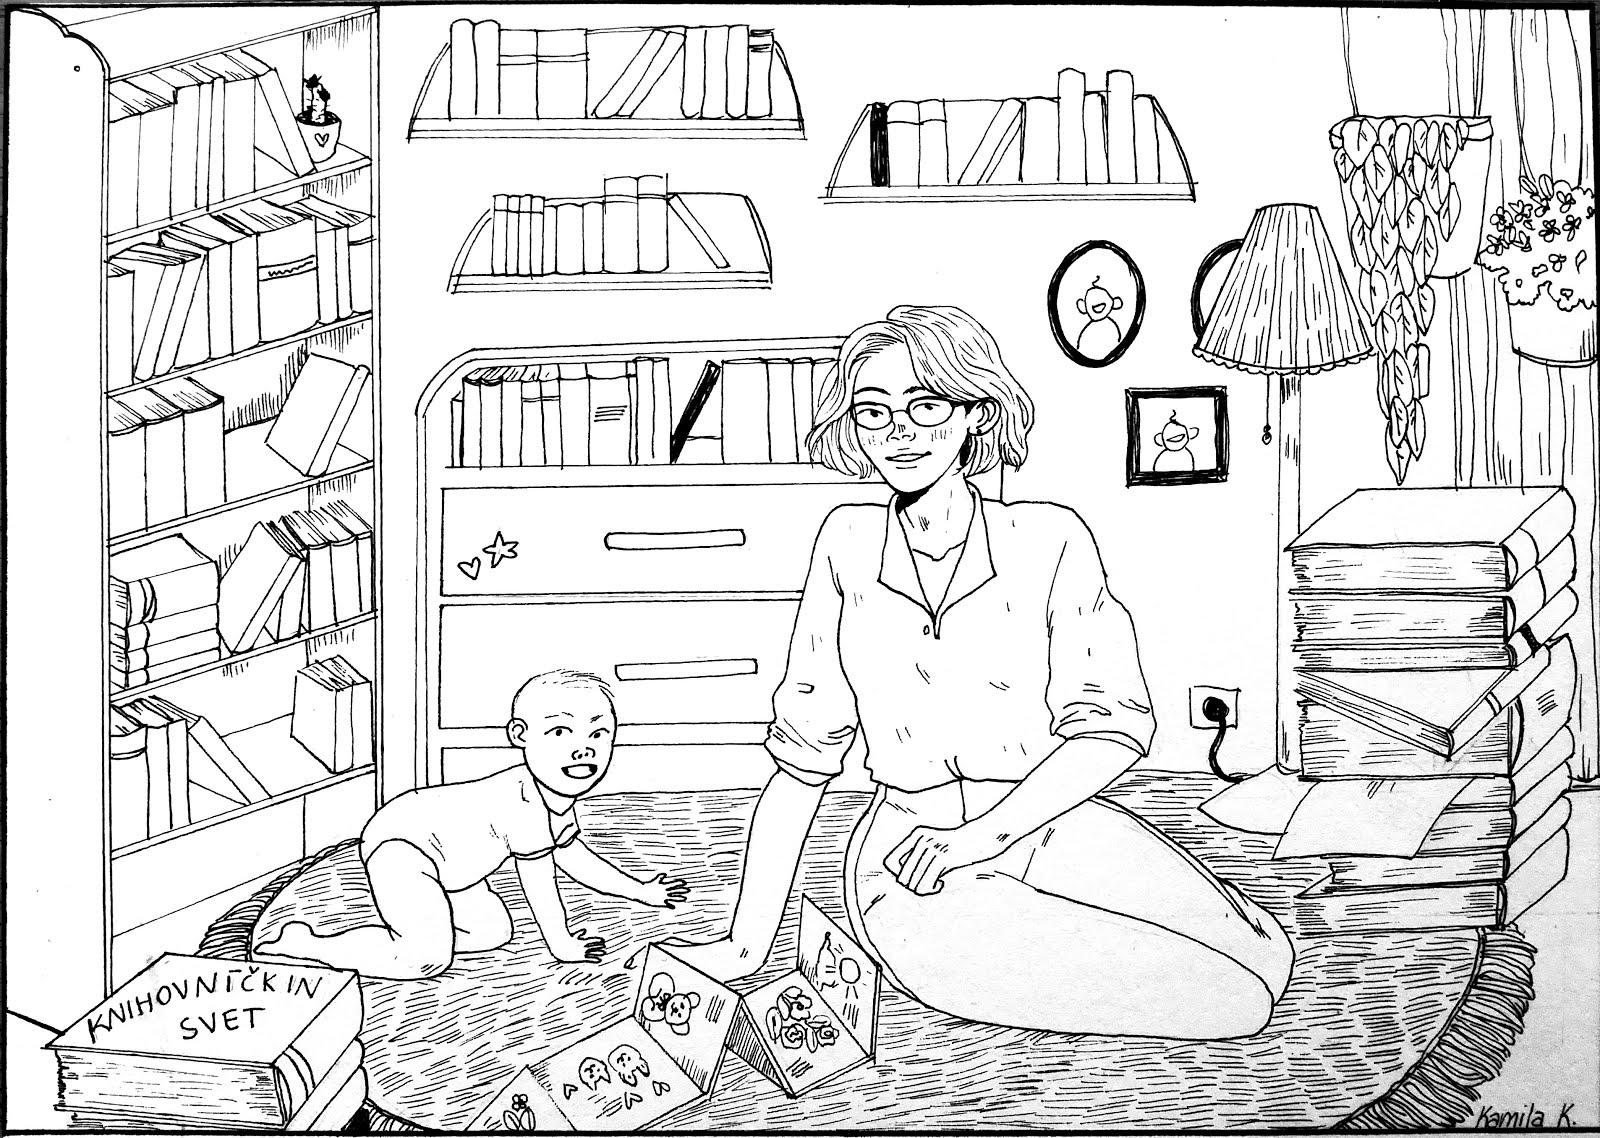 Knihovníčkin svet